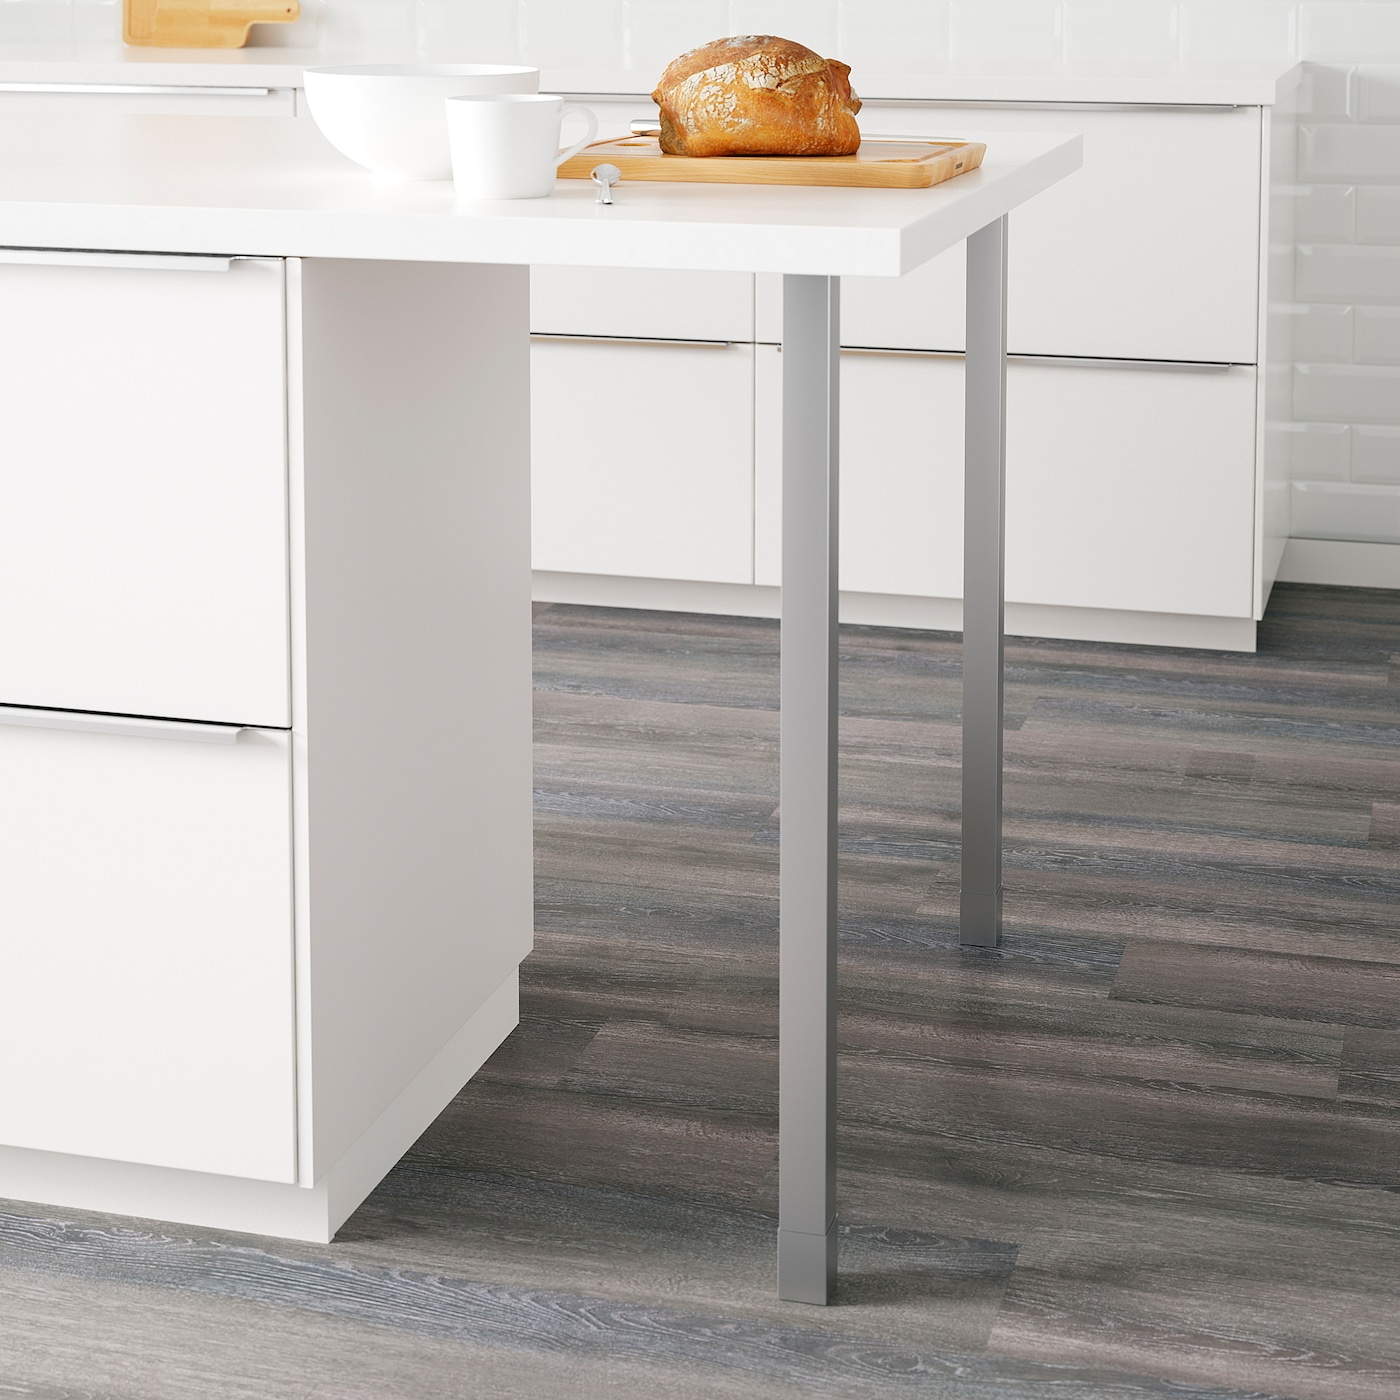 Utby Pied Acier Inoxydable 86 Cm Ikea